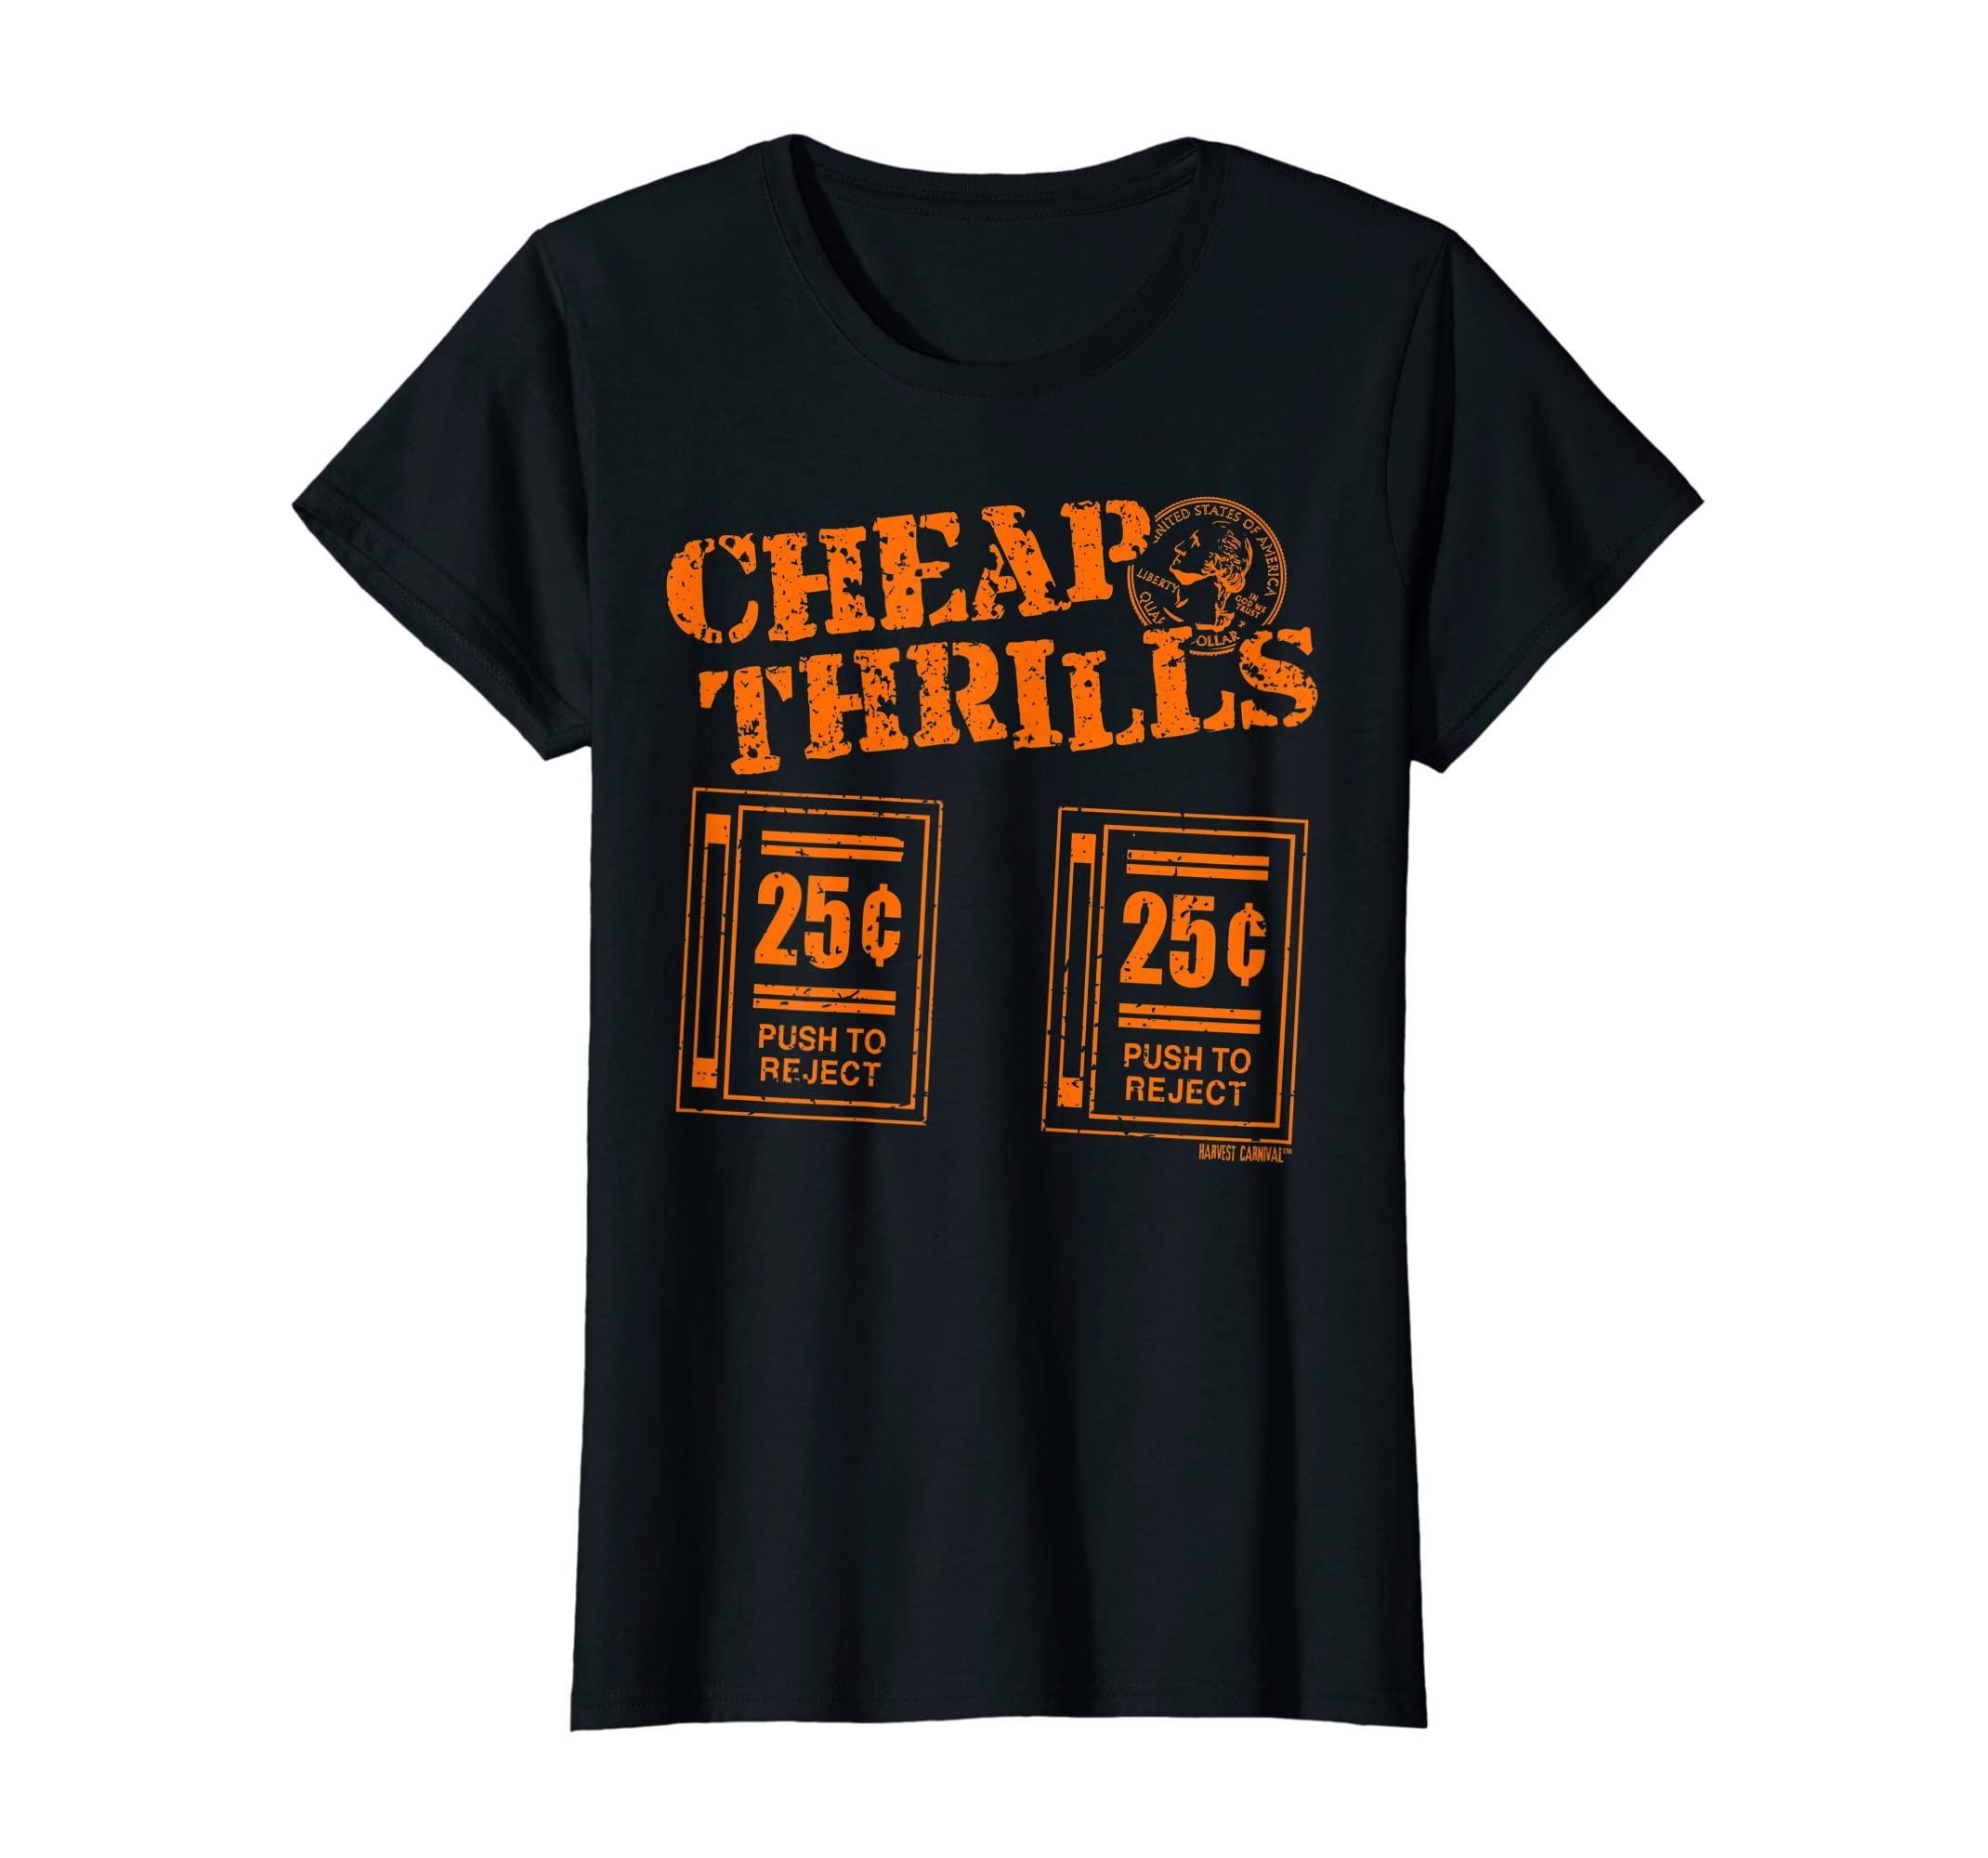 751556e0a Amazon.com: Cheap Thrills - Video Game Men's & Women's Graphic T-shirt:  Clothing